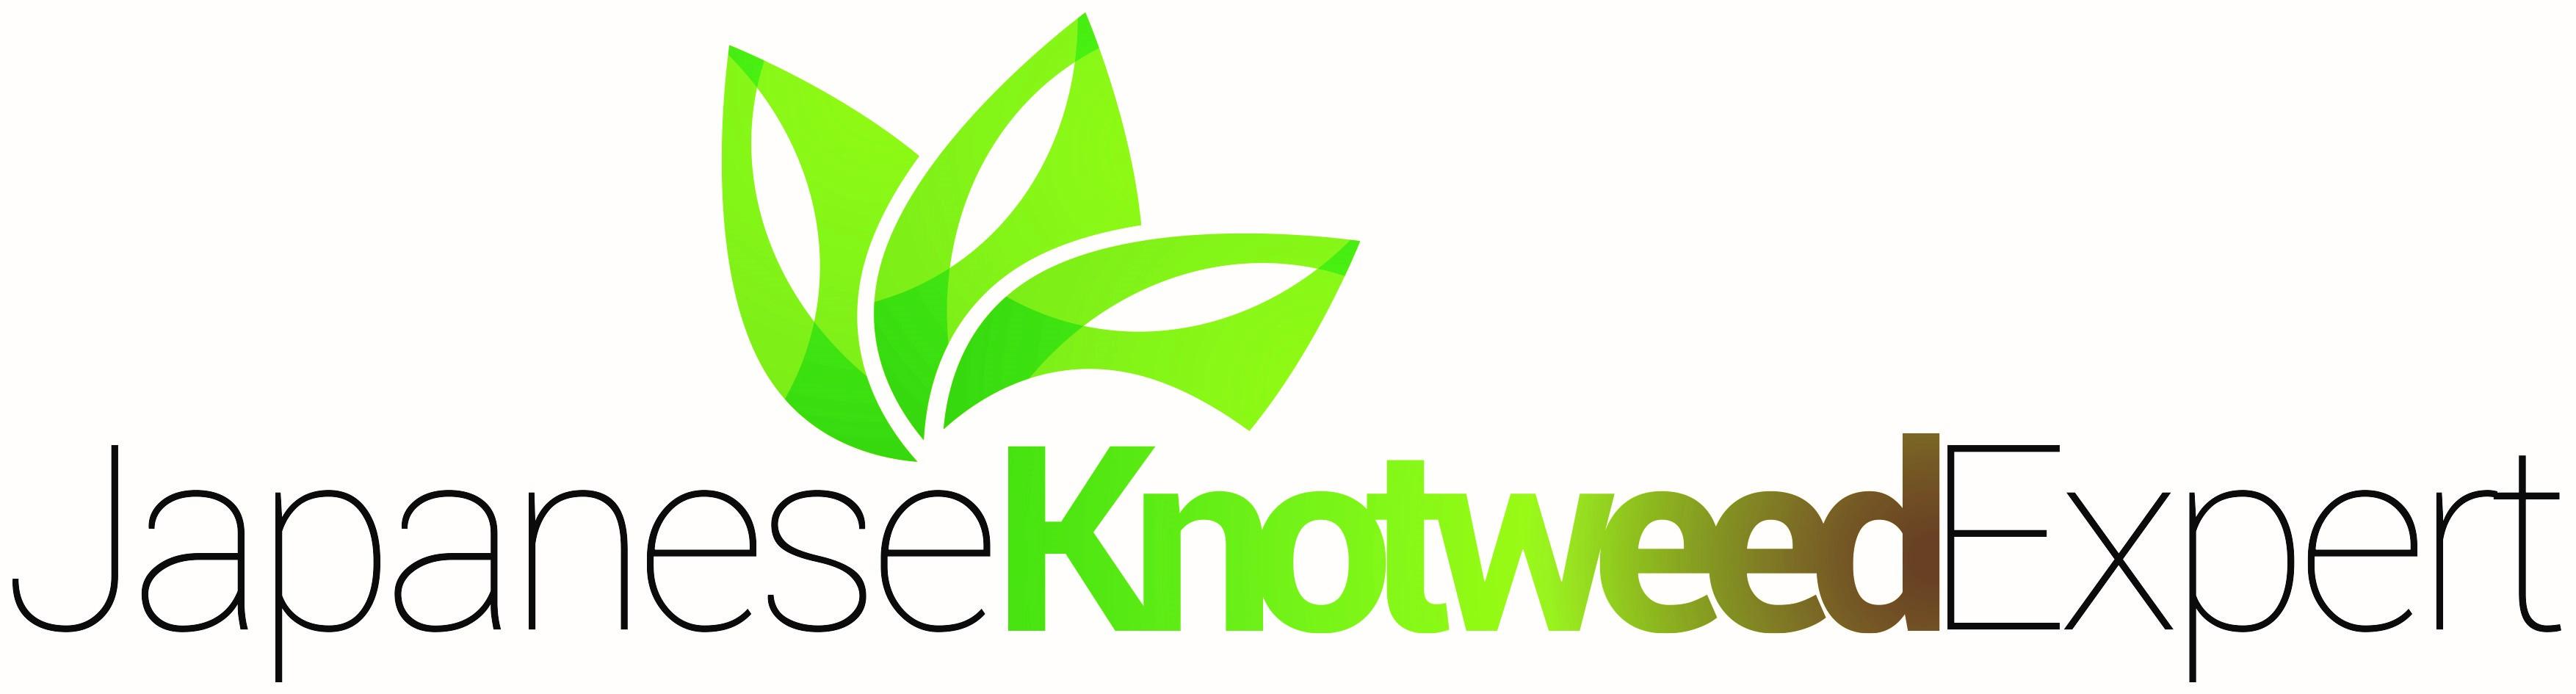 Japanese Knotweed Expert – Japanese Knotweed Removal and Eradication